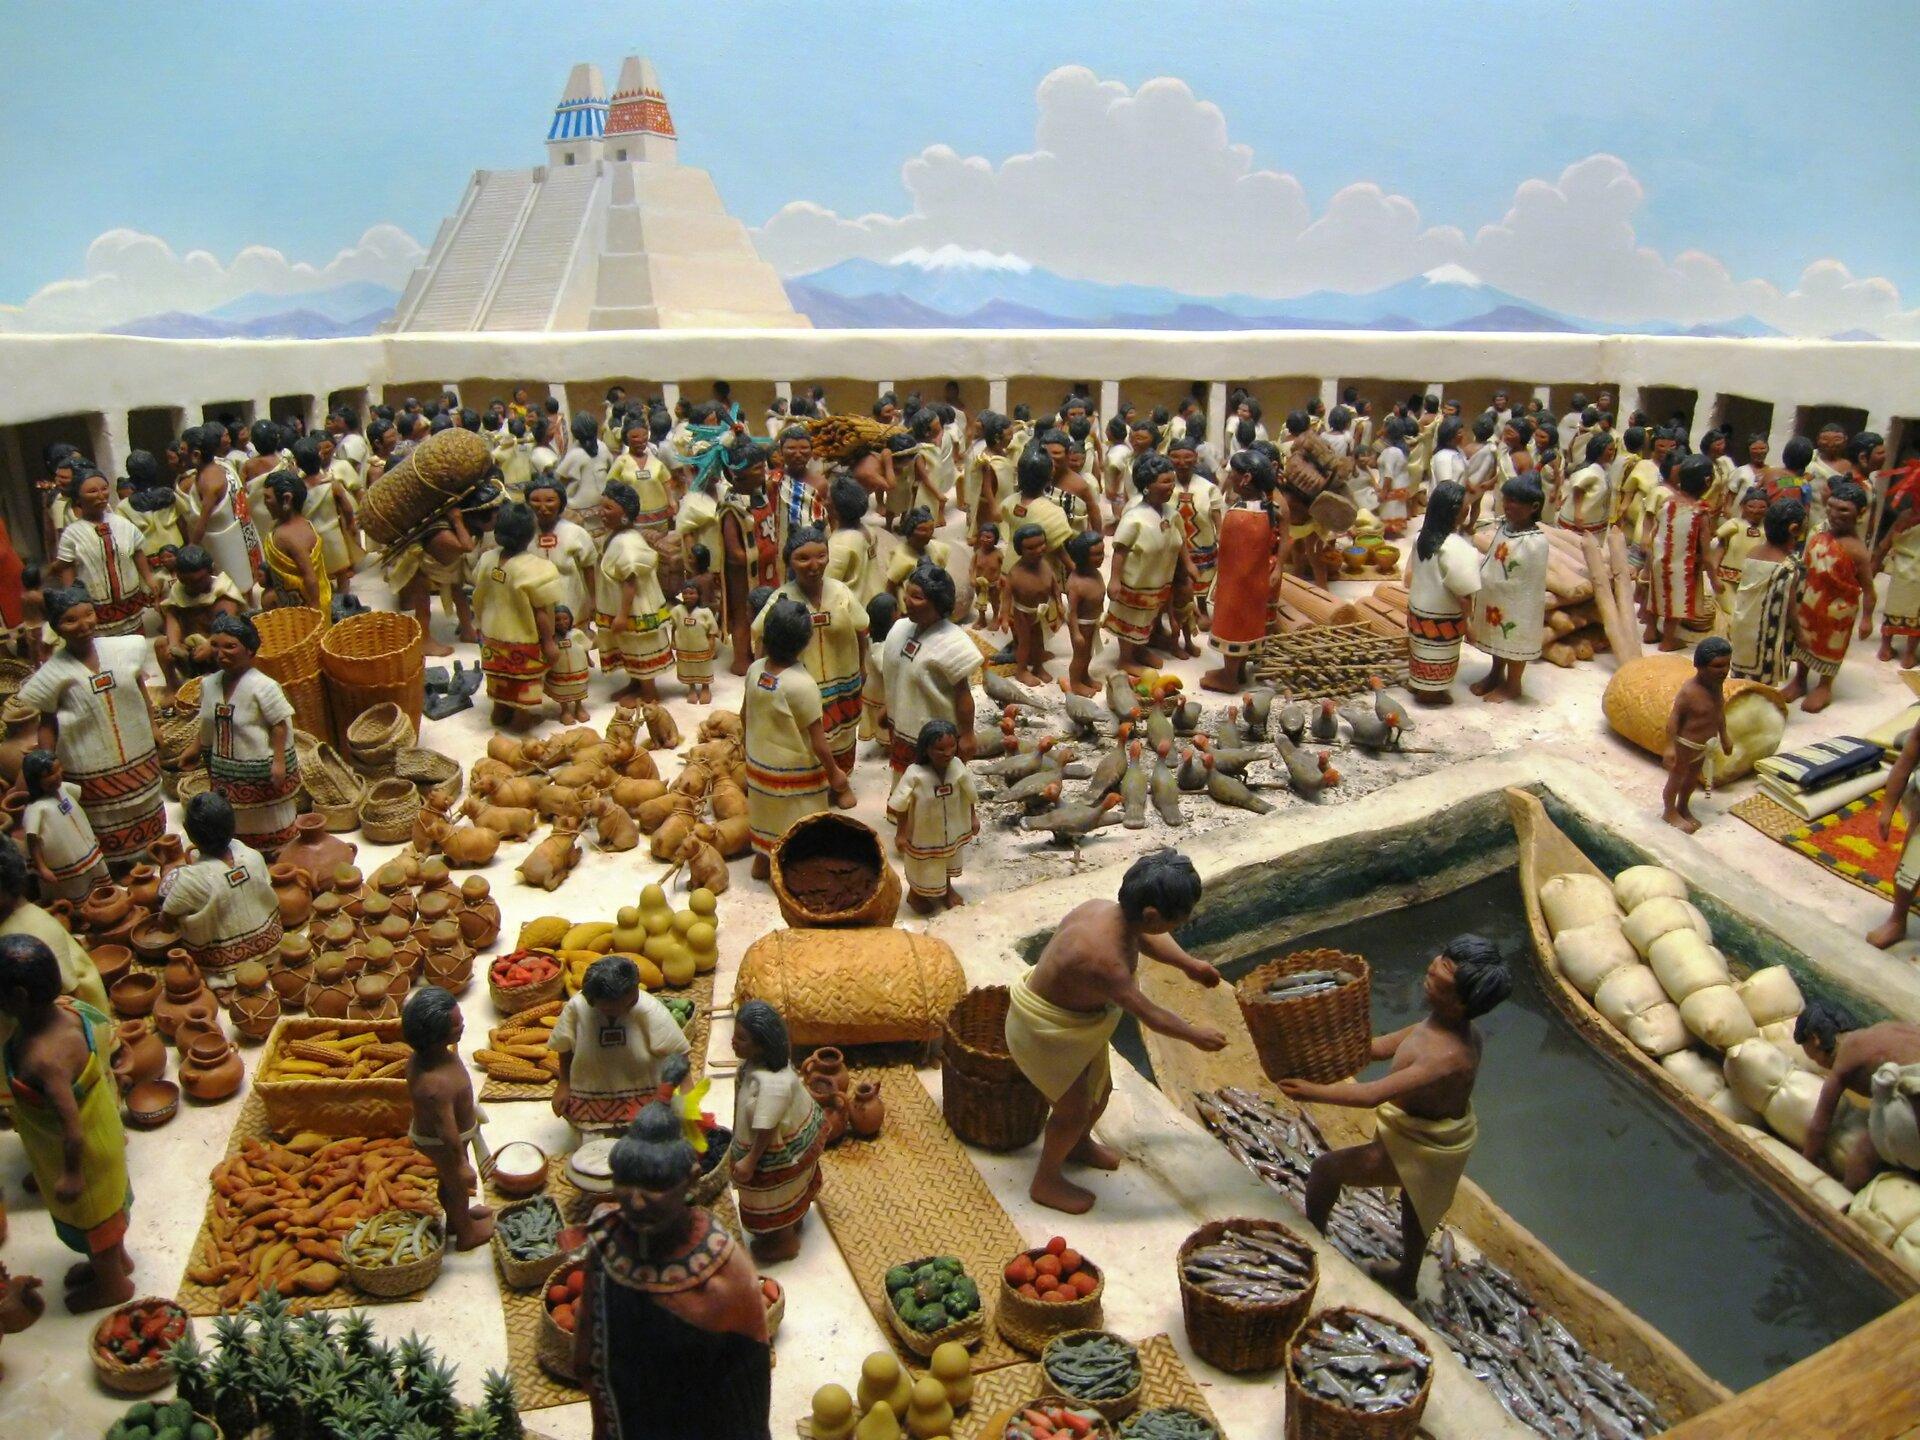 Aztecki targ Aztecki targ Źródło: Joe Ravi, 2010, Wikimedia Commons, licencja: CC BY-SA 3.0.